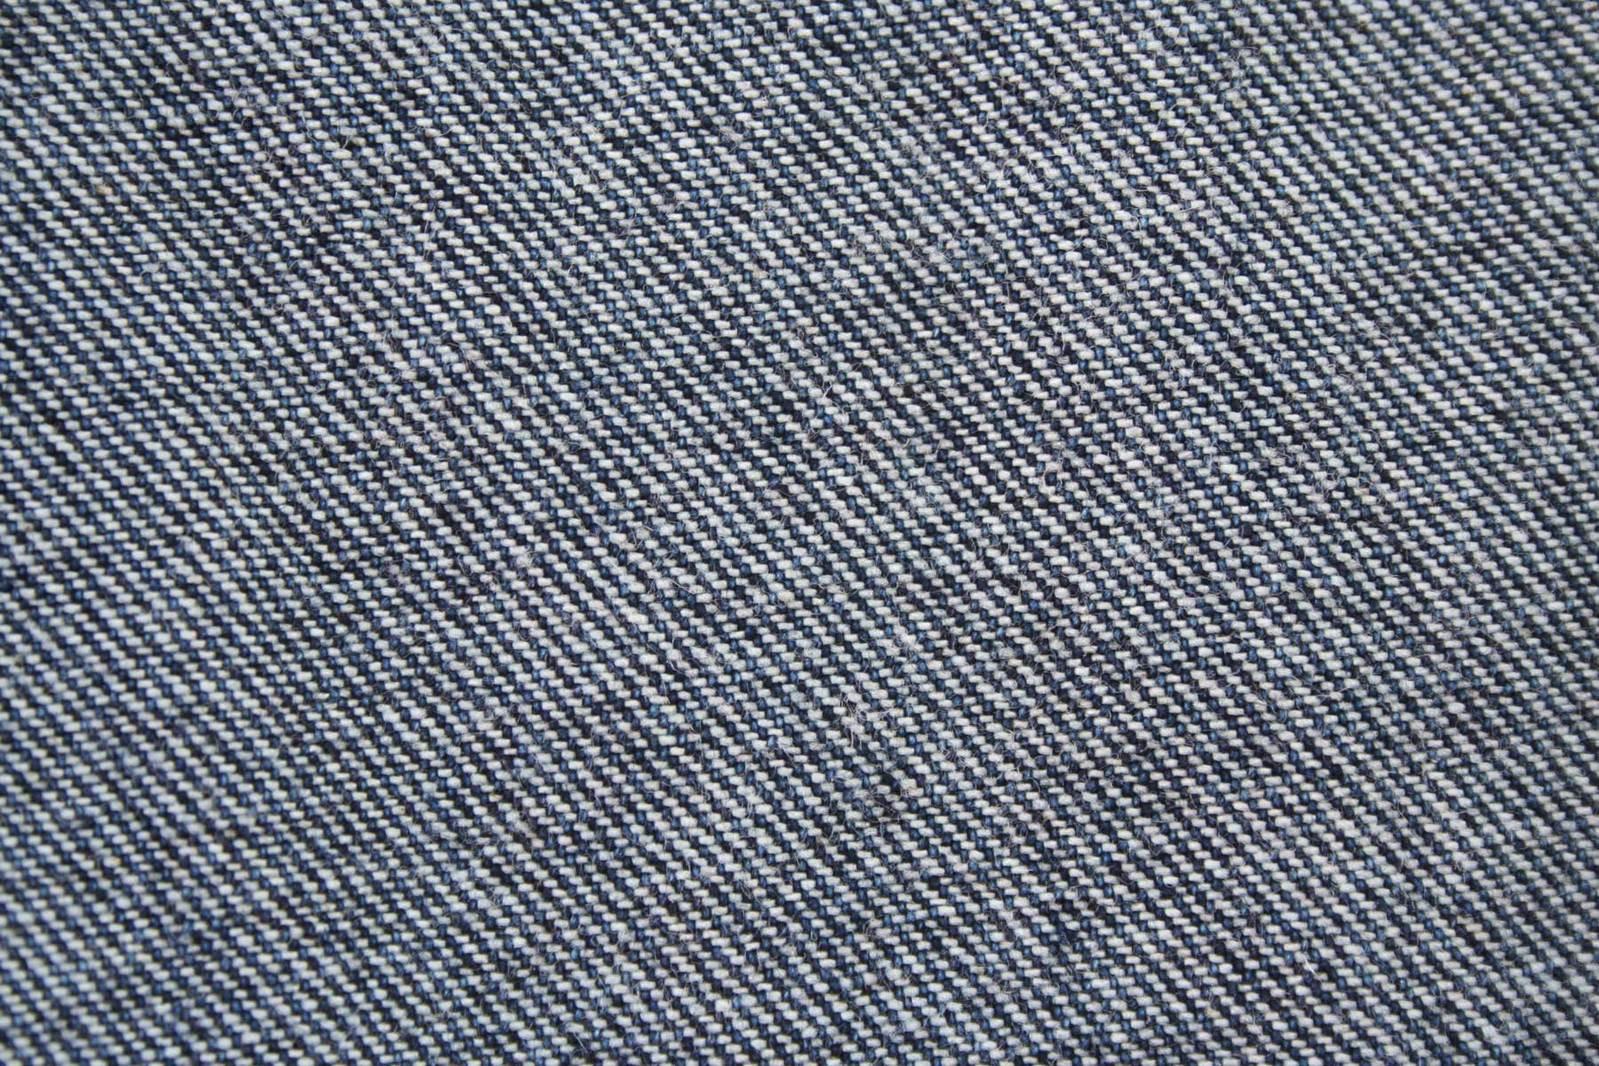 Free Denim Jeans Texture Stock Photo Freeimages Com